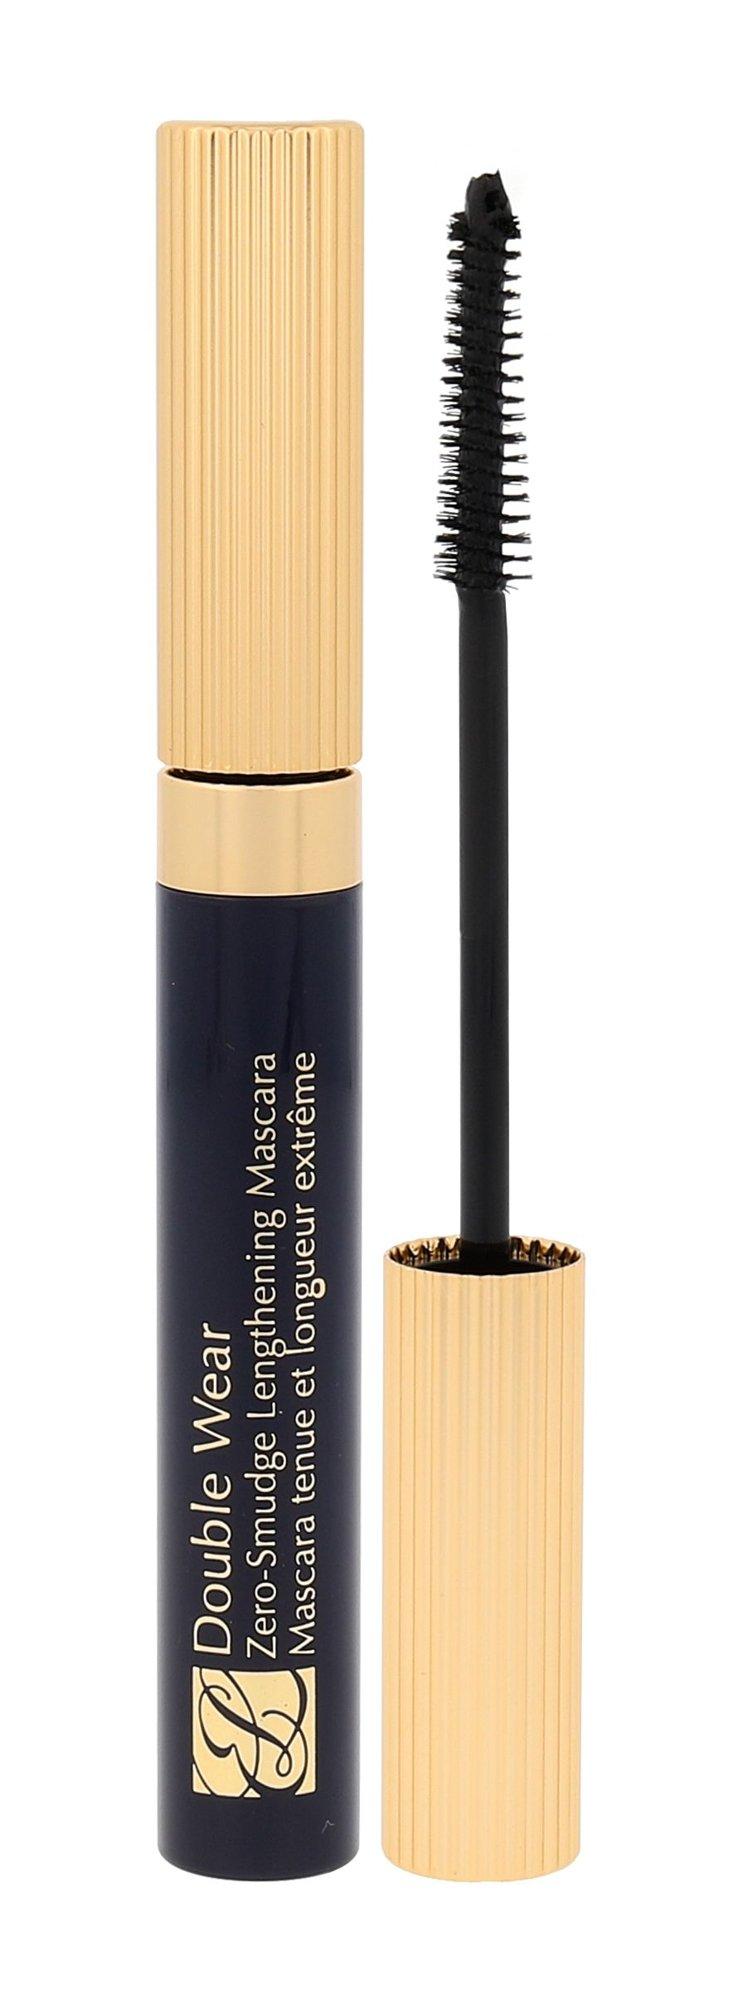 Estée Lauder Double Wear Cosmetic 6ml 01 Black